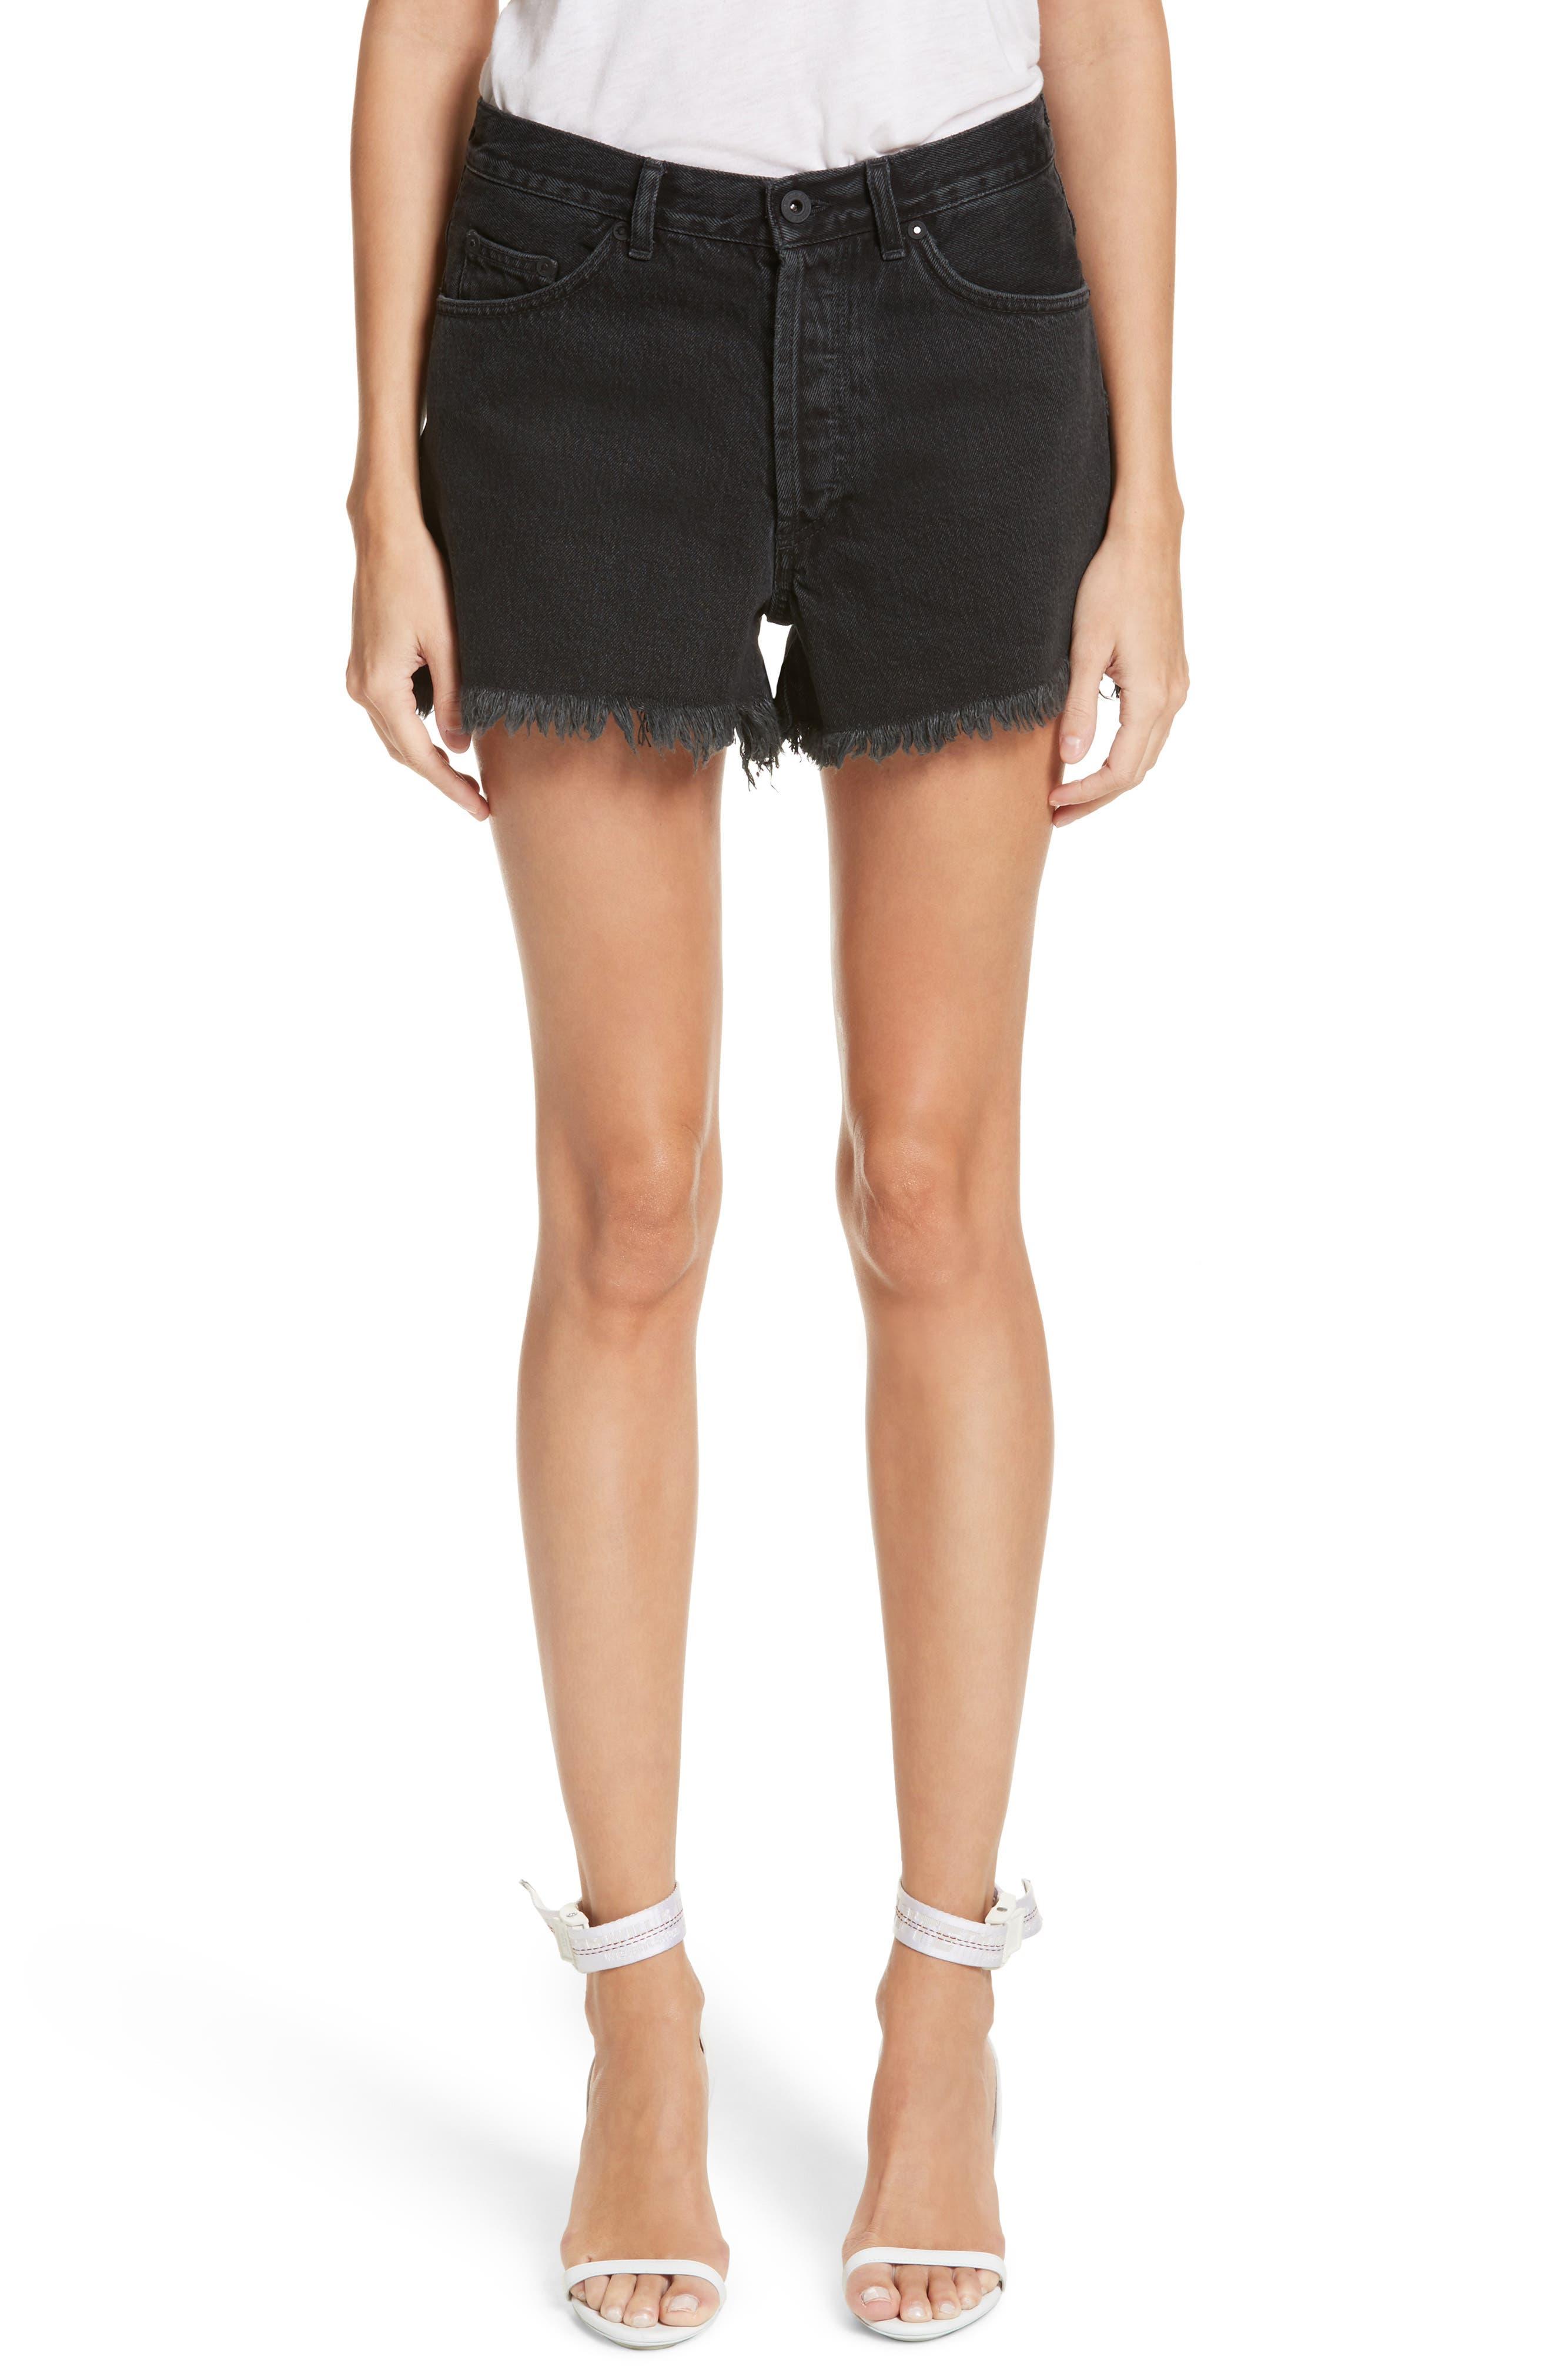 Alternate Image 1 Selected - Off White Fern 5 Pocket Shorts